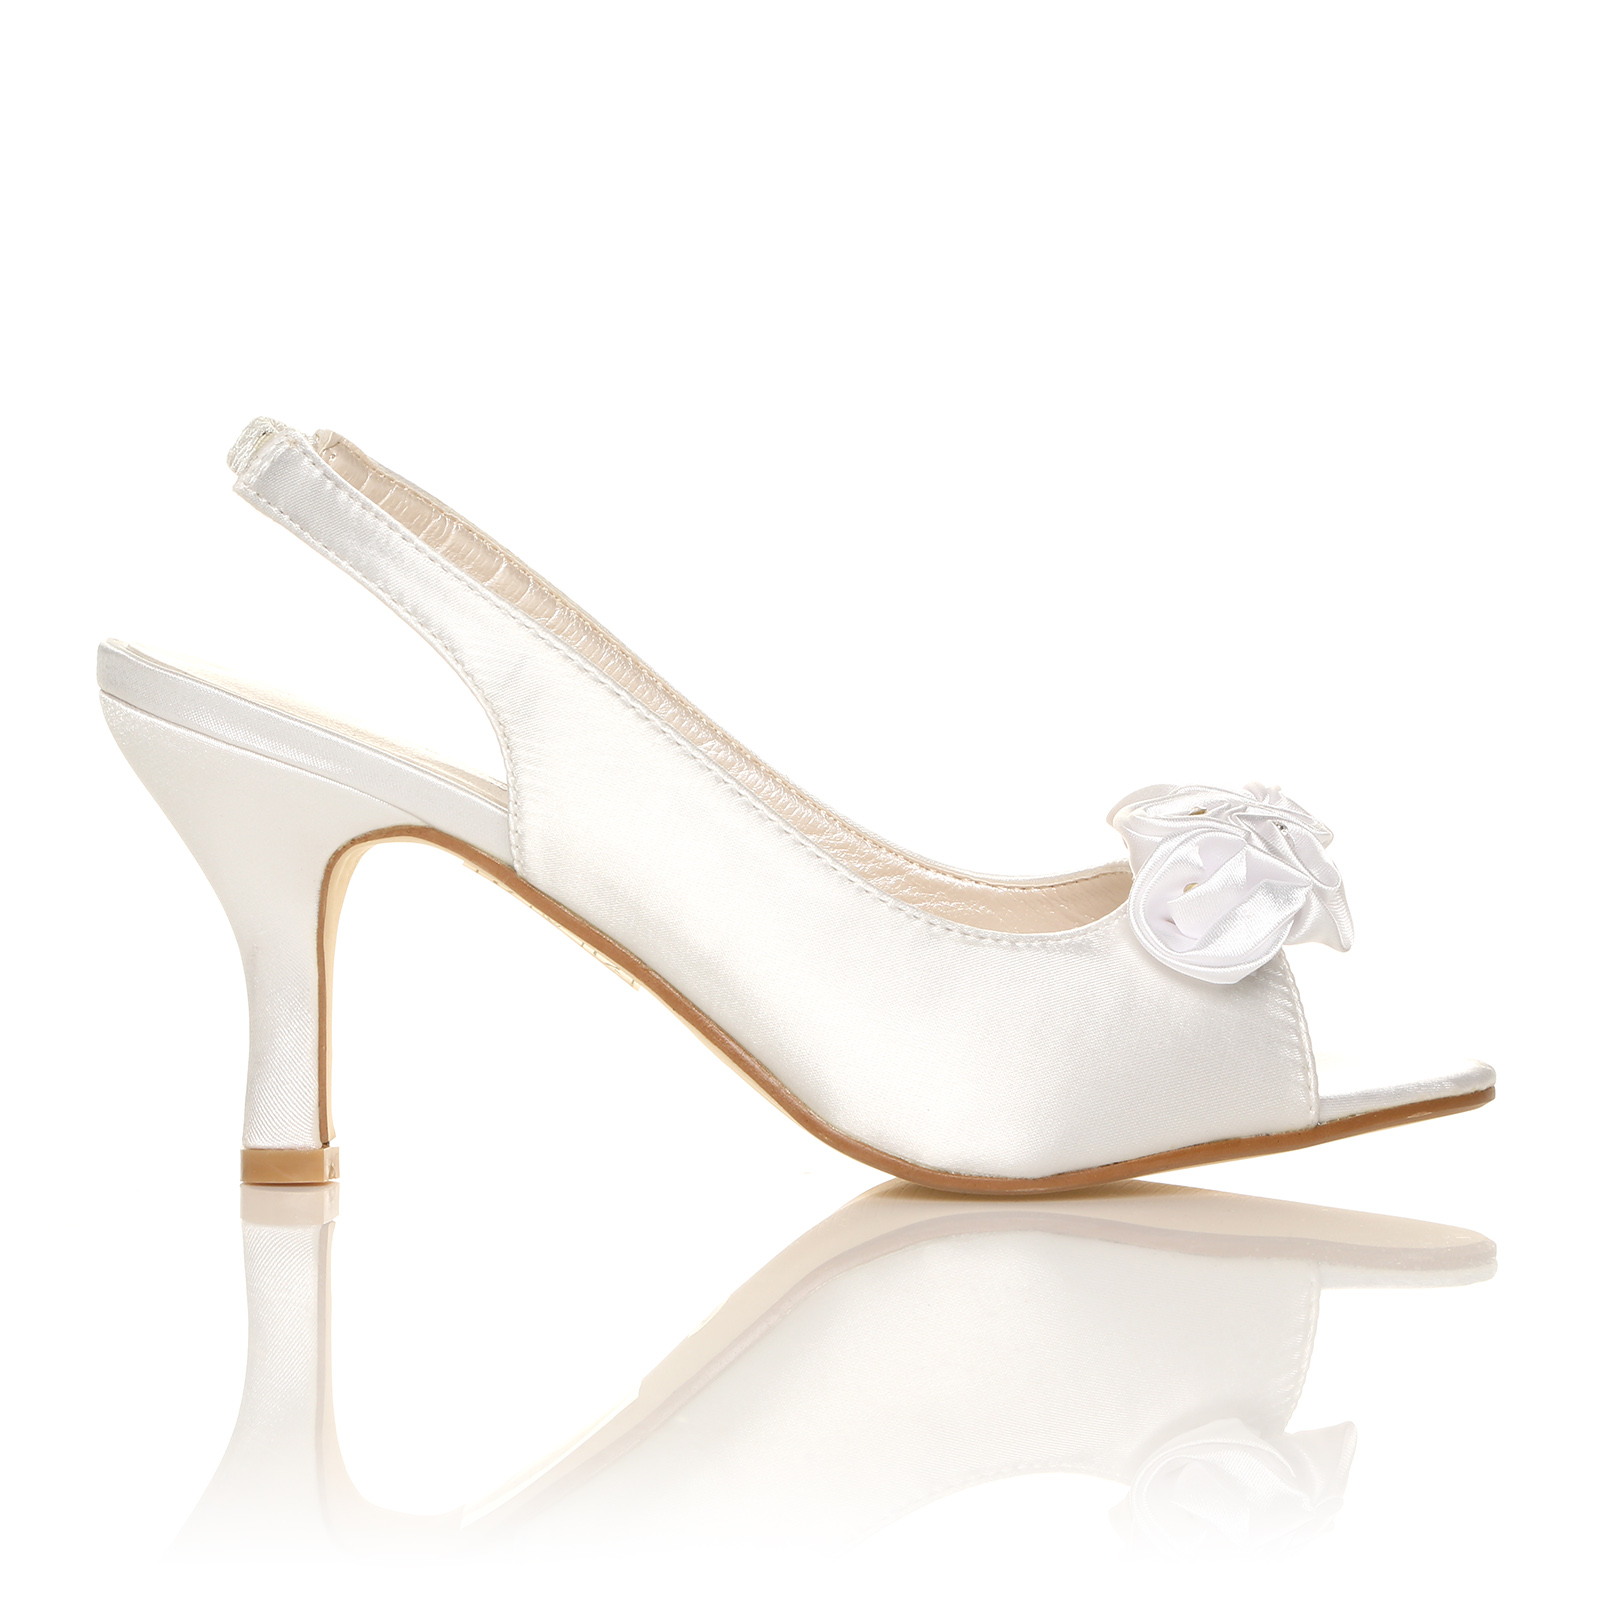 NEW WOMENS IVORY WHITE SATIN WEDDING BRIDAL STRAP SHOES